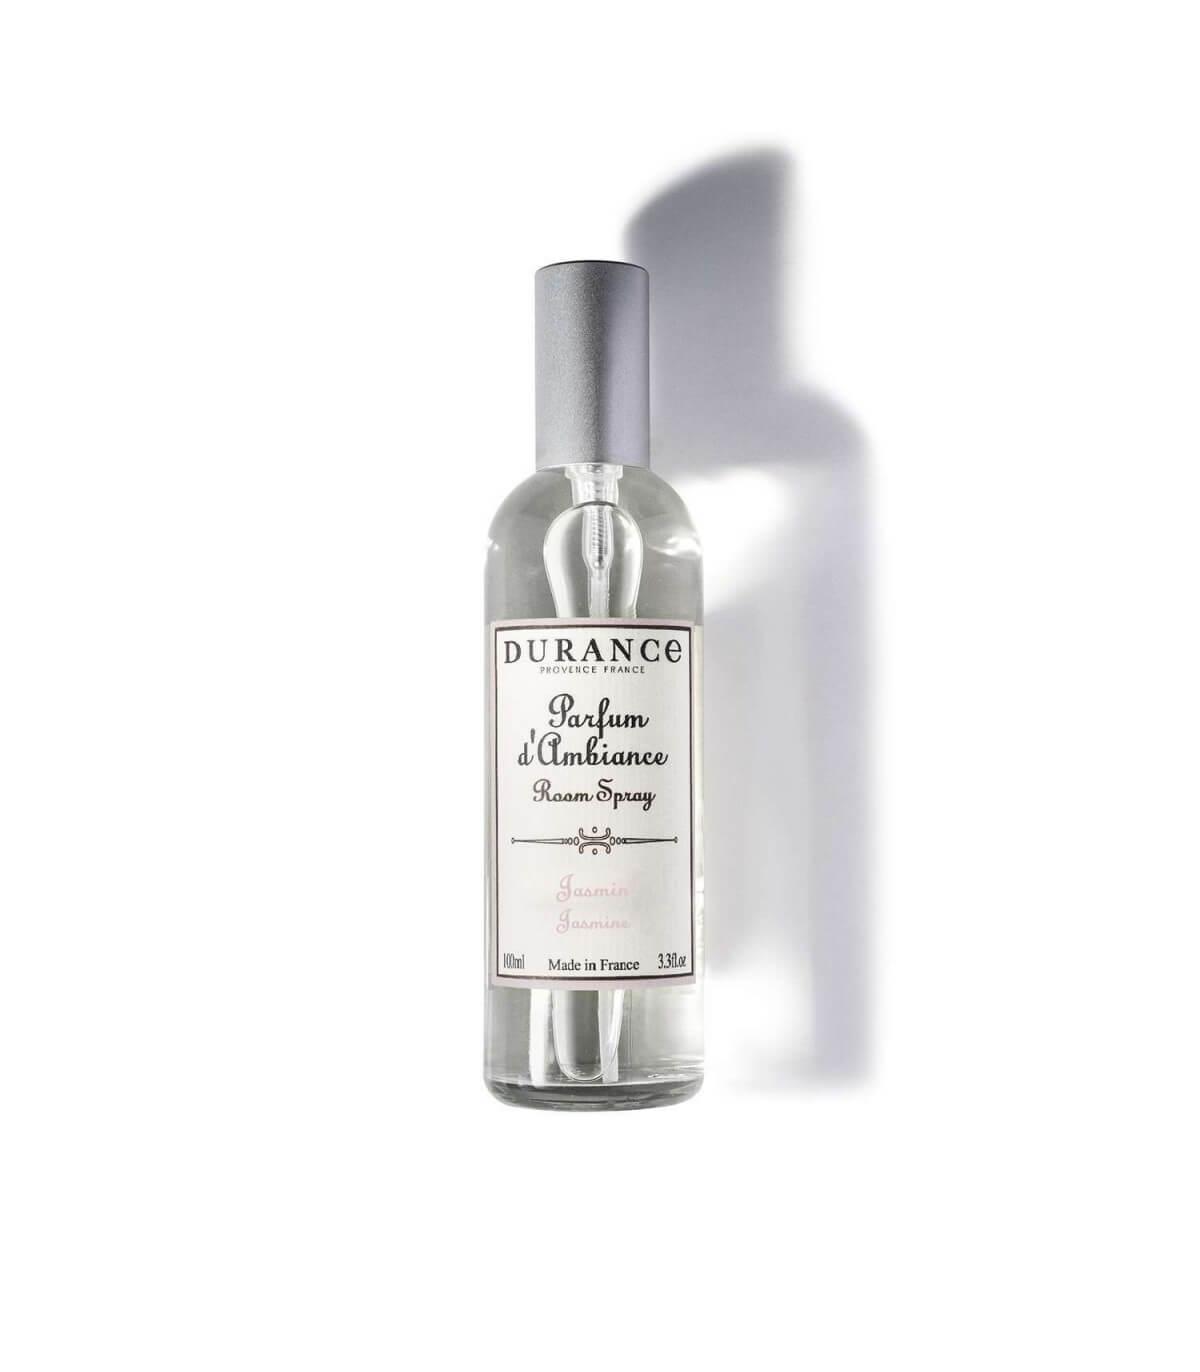 Parfum d'ambiance jasmin de Grasse